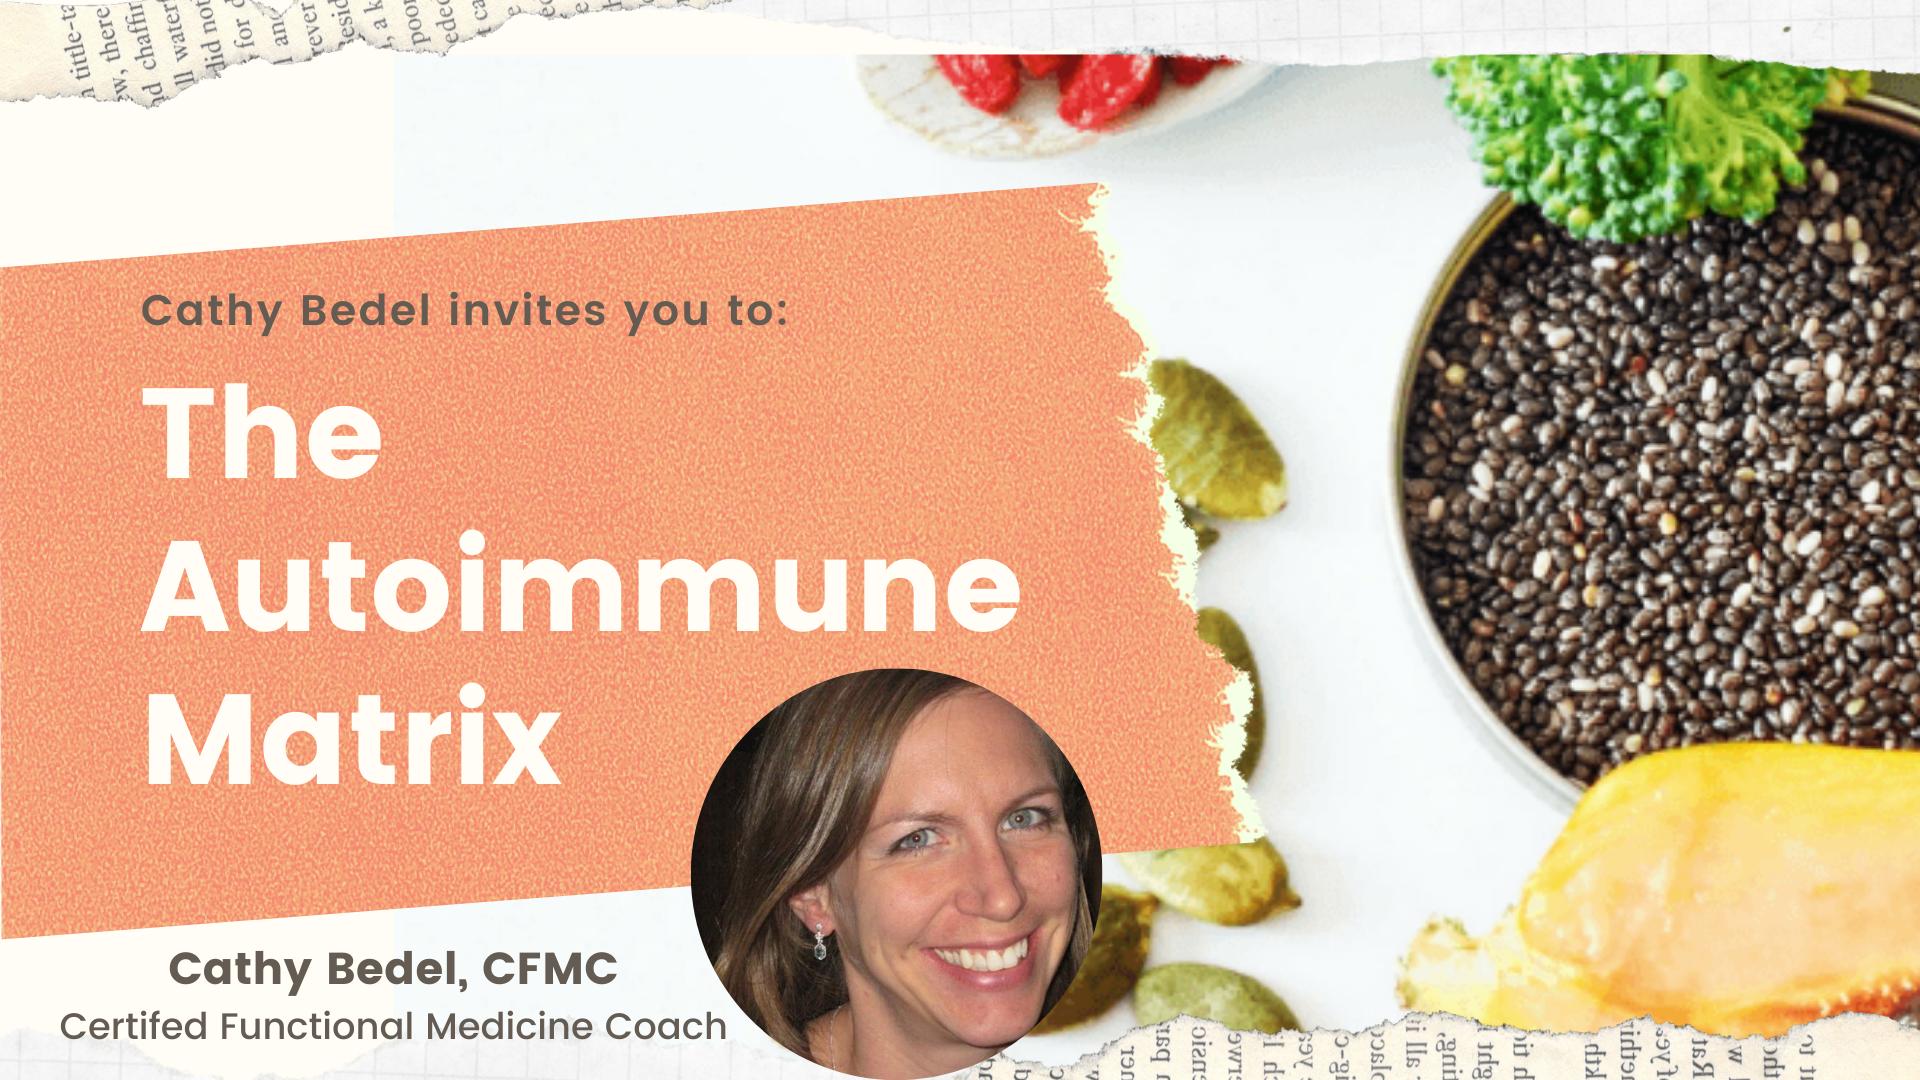 Cathy Bedel's The Autoimmune Matrix